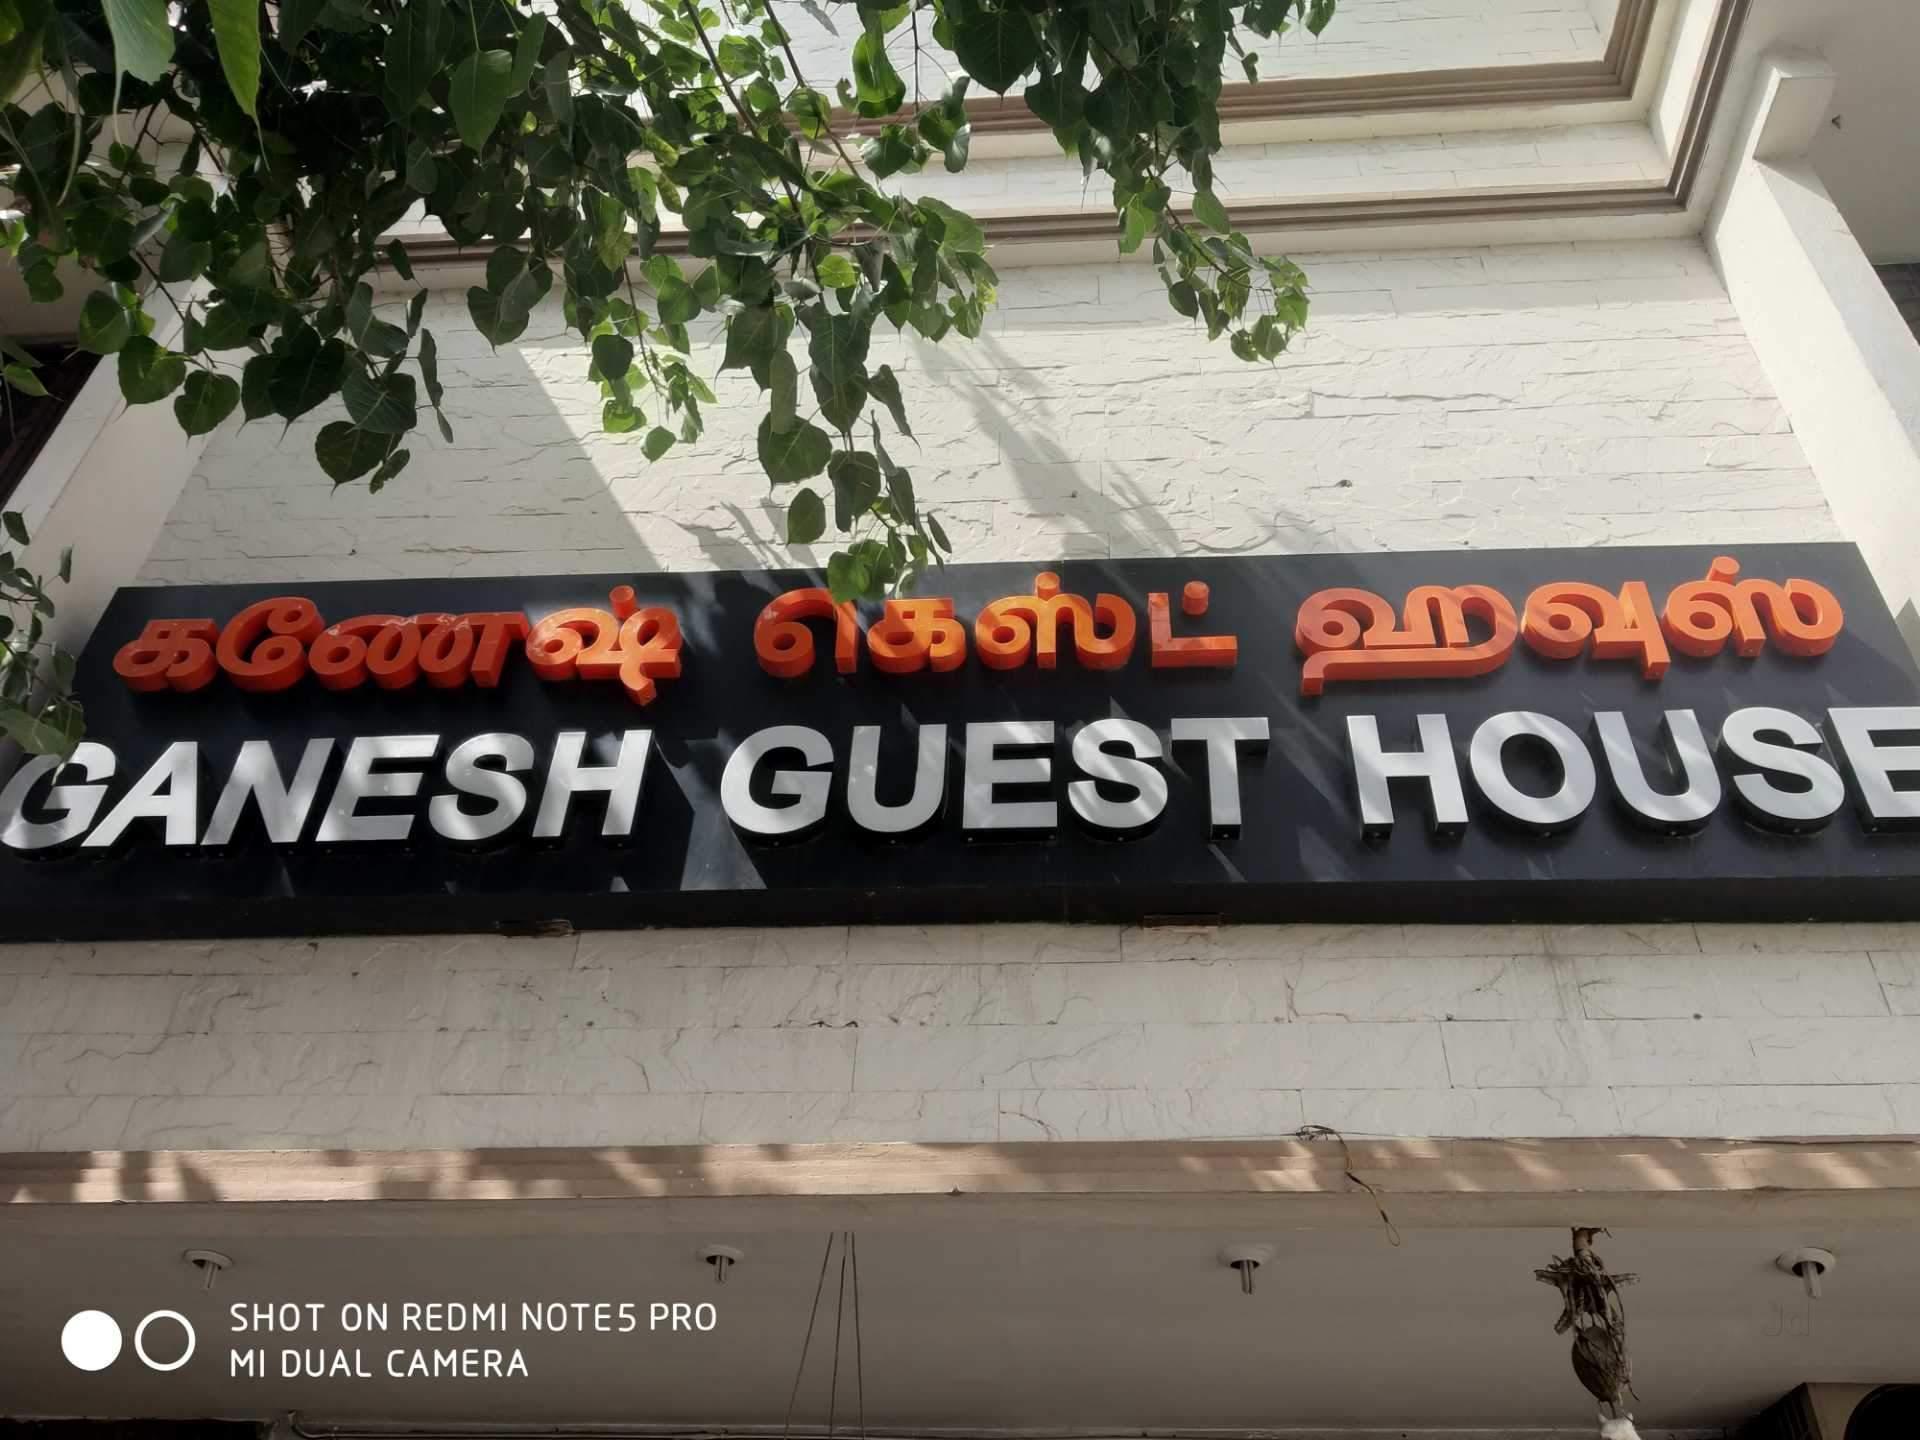 Ganesh Guest House